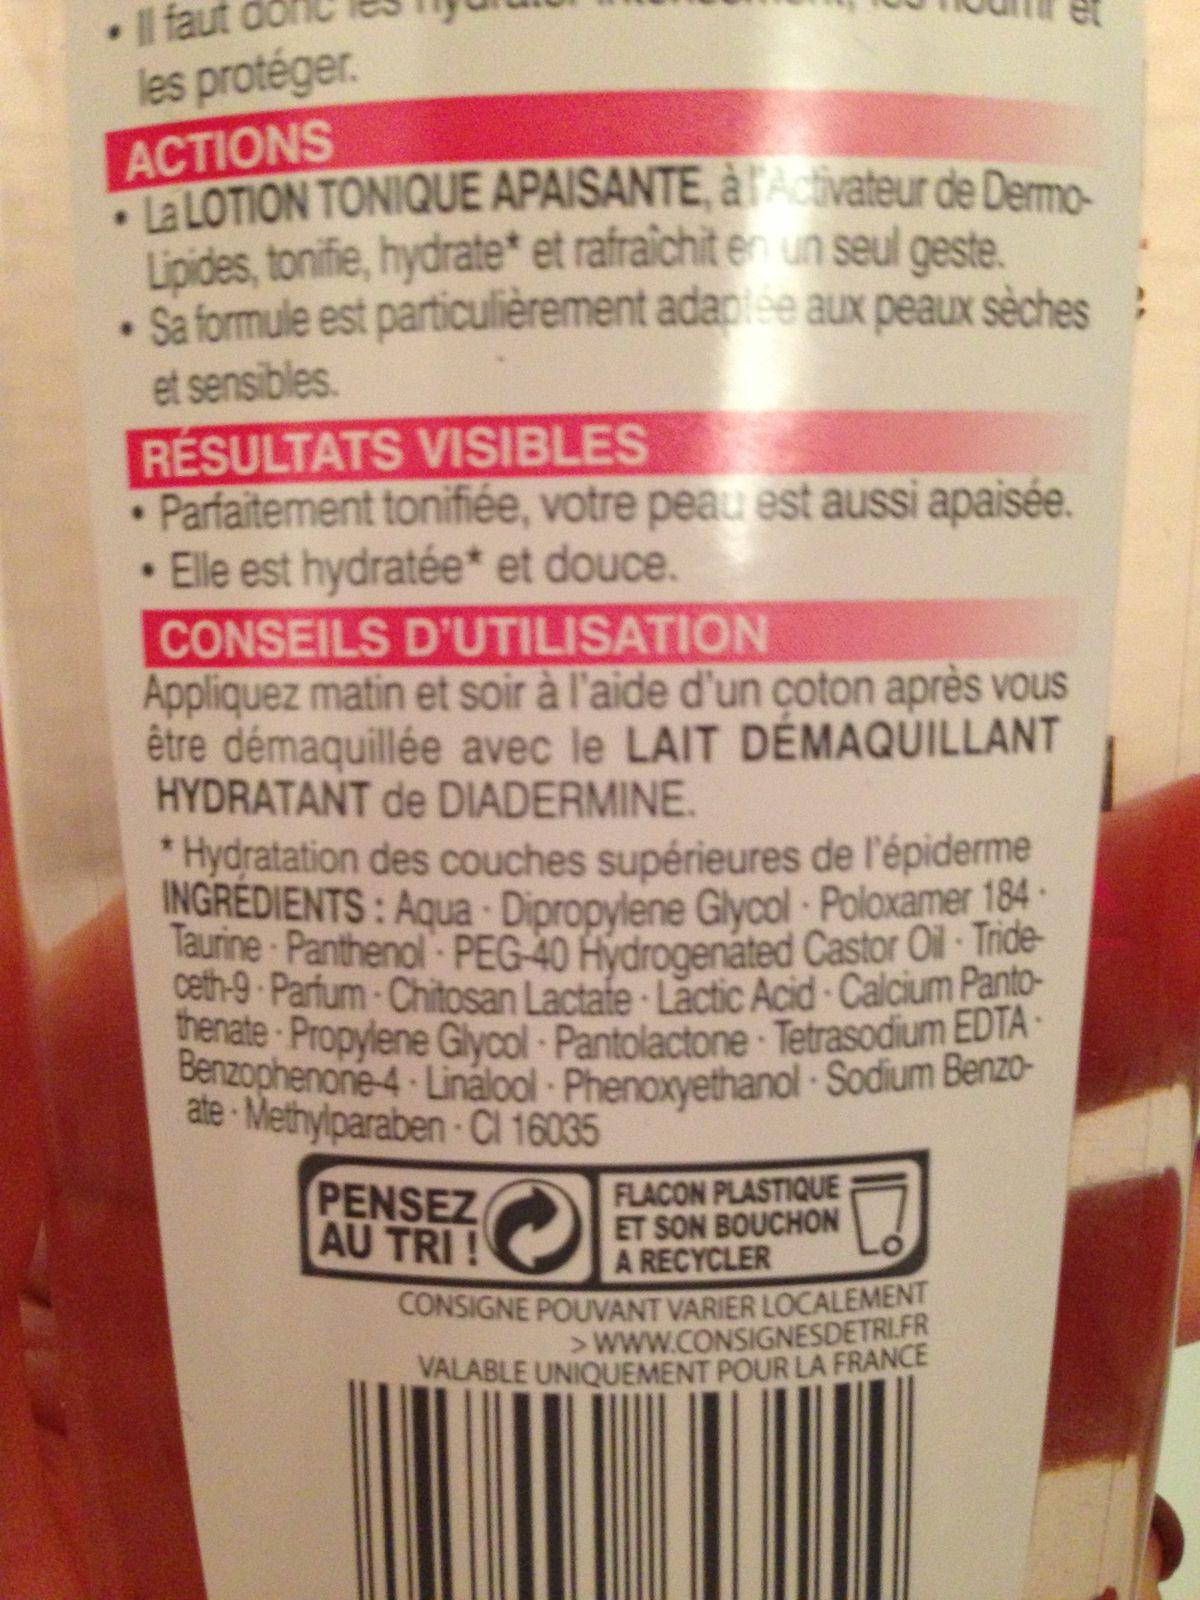 Lotion tonique apaisante de Diadermine